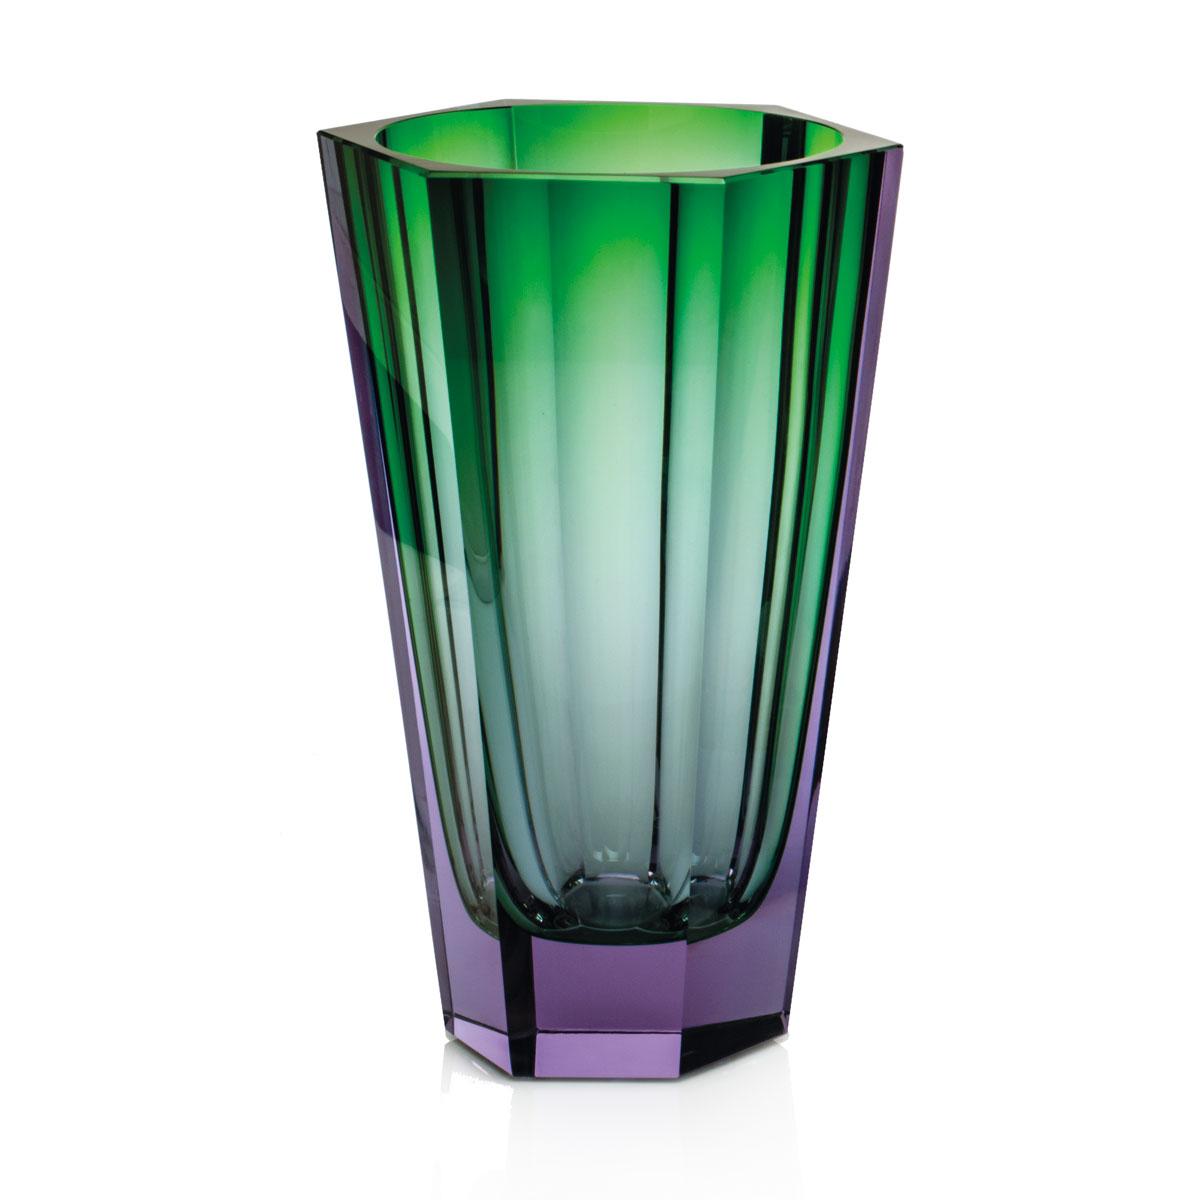 "Moser Purity 11"" Vase Alexandrite Green"